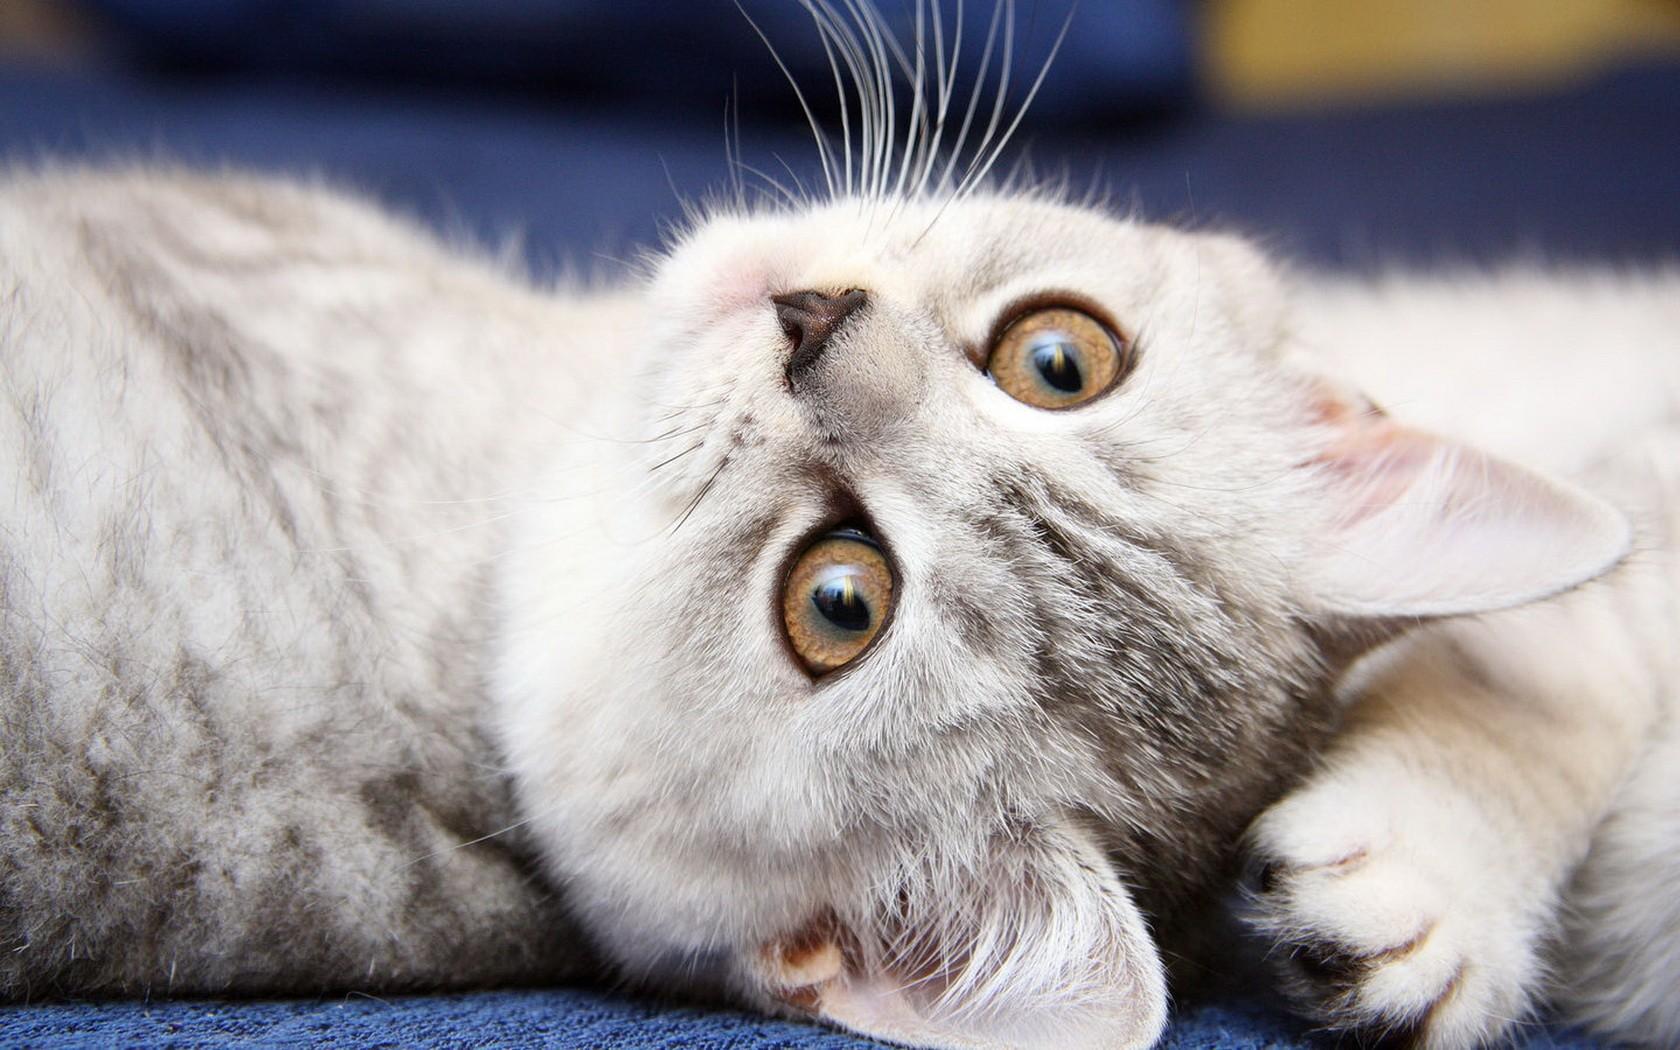 Gato blanco volteado - 1680x1050